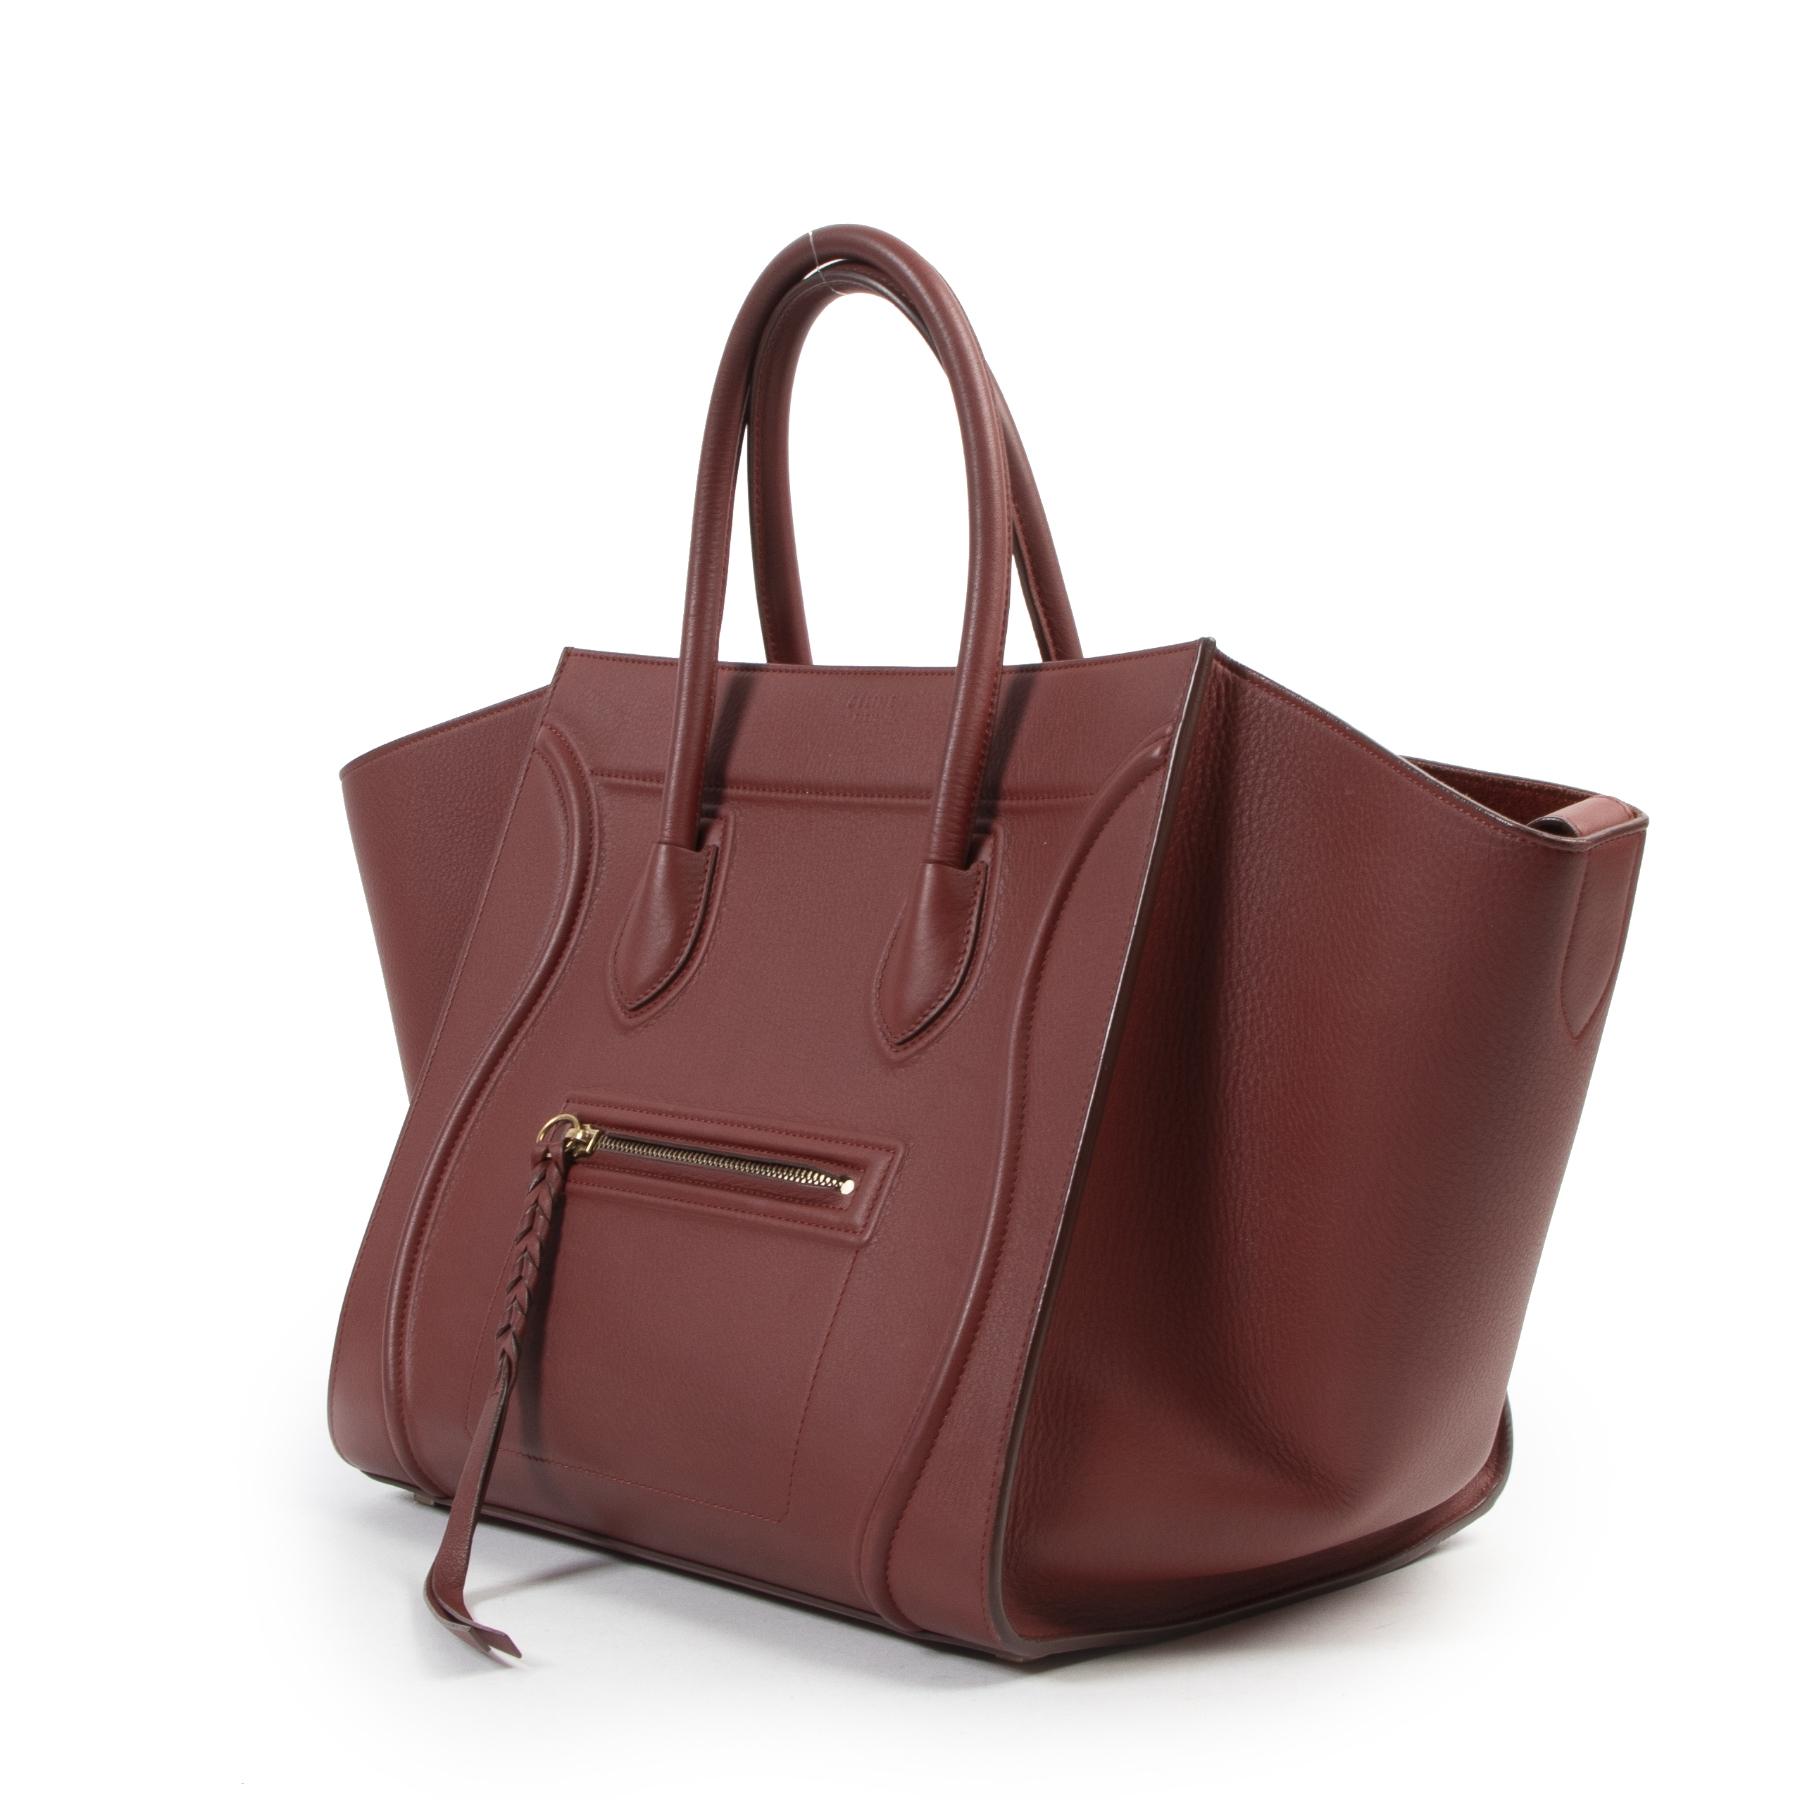 Authentieke tweedehands Celine te koop bij LabelLOV Celine Merlot Red Phantom Luggage Bag